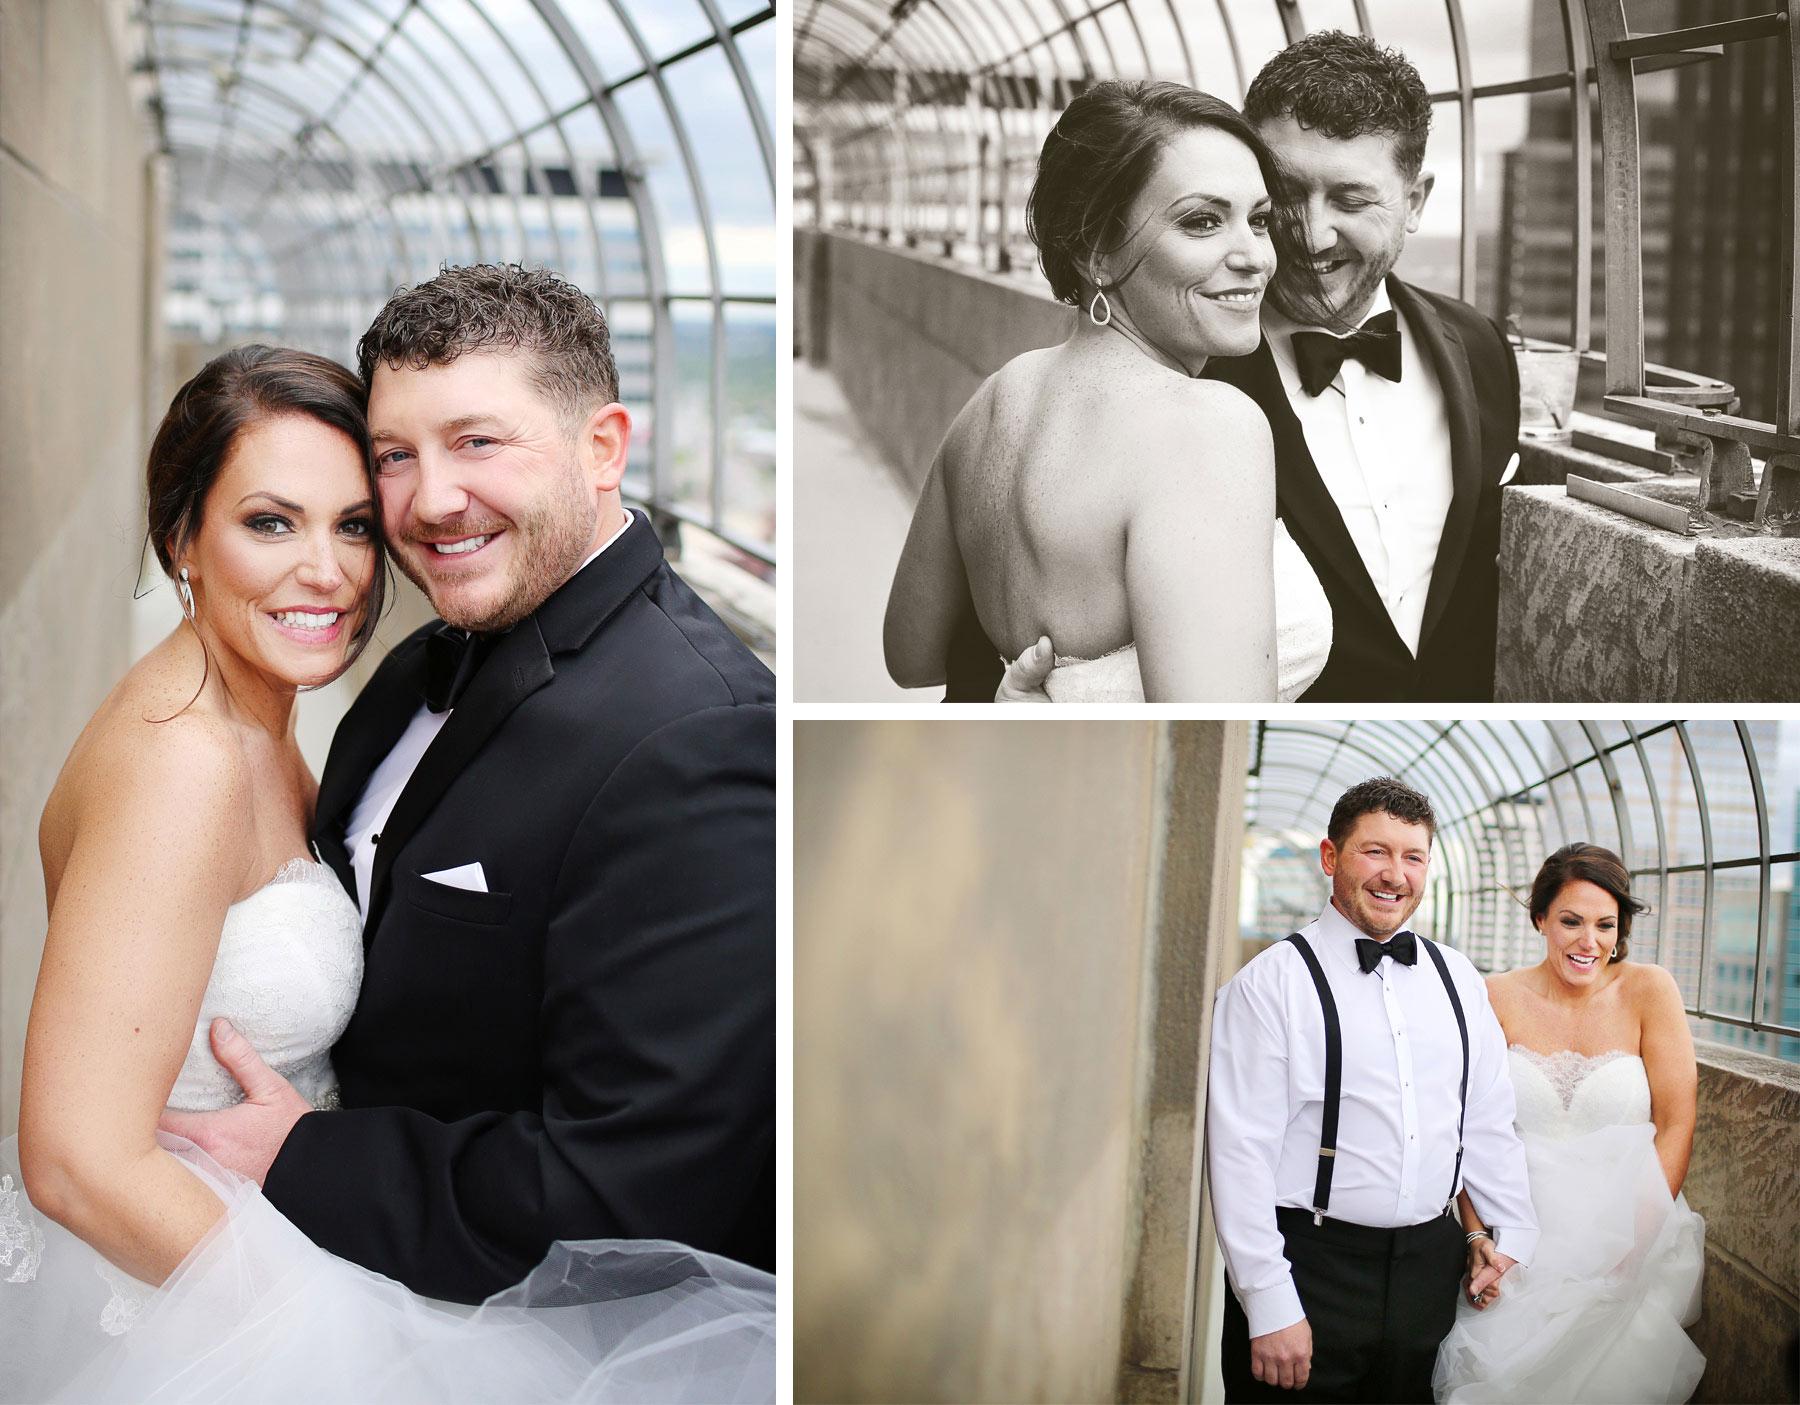 05-Minneapolis-Minnesota-Wedding-Photography-by-Vick-Photography-Downtown-Foshay-Skyline-Megan-and-Andrew.jpg